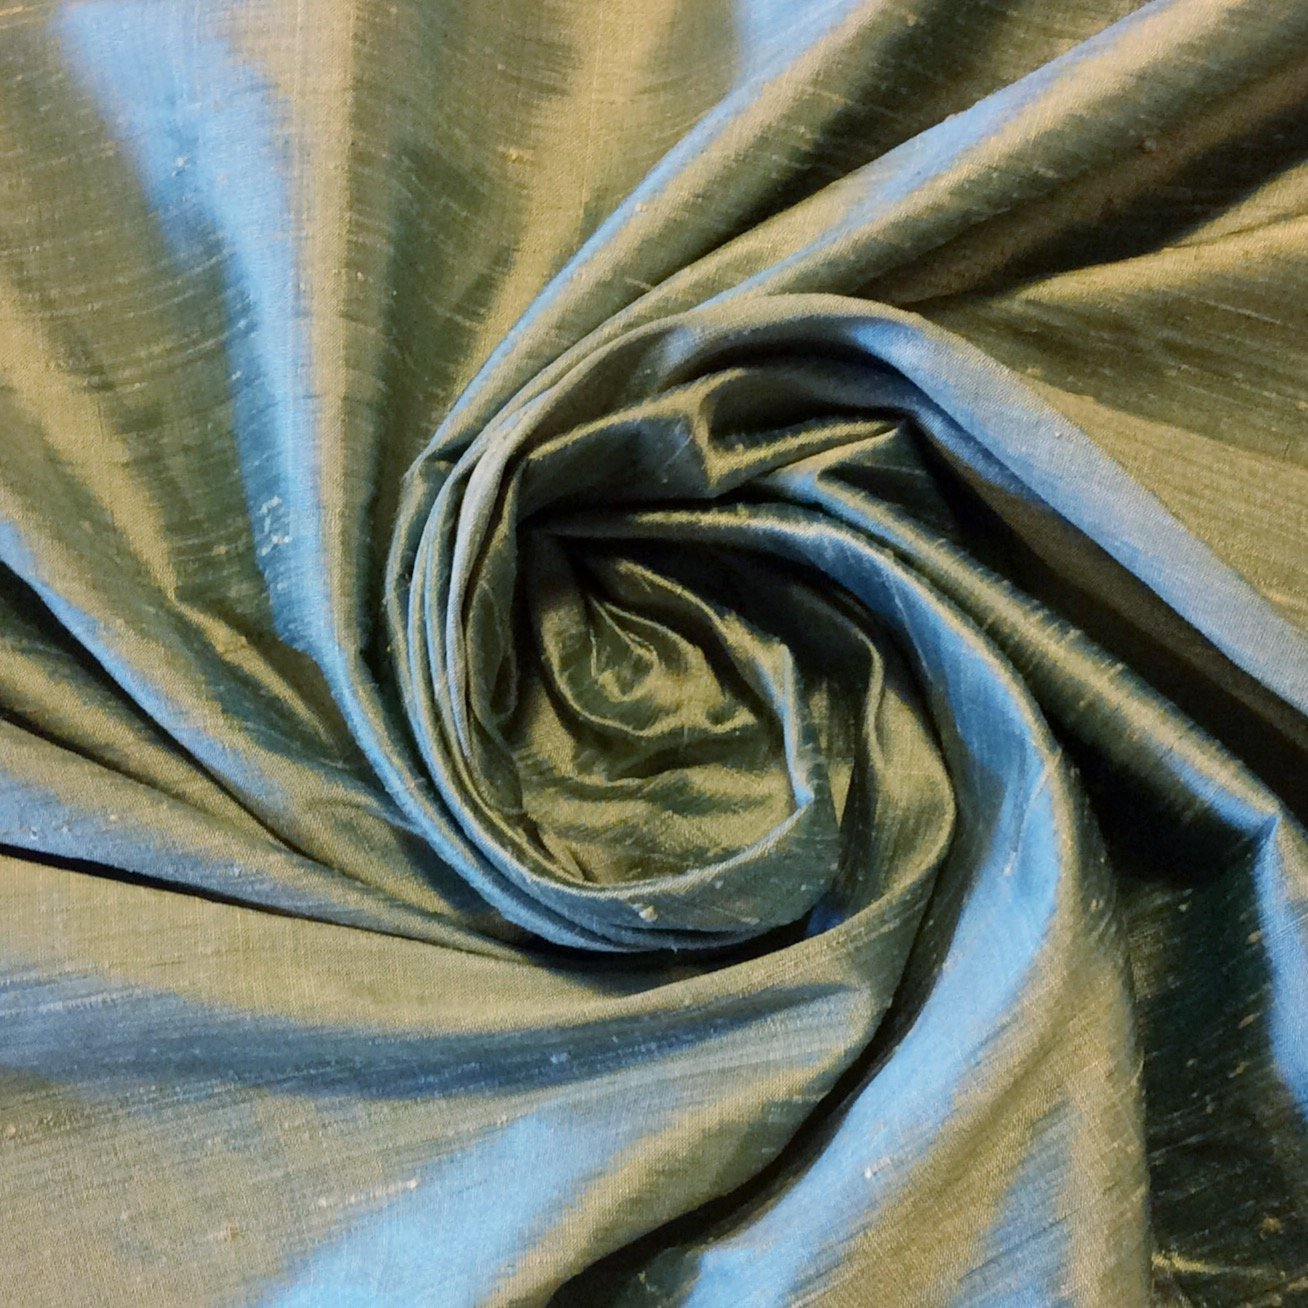 SILK SH06 Jade Green Exquisite Hand Woven Dupioni 100% Silk Fabric Drapery Fabric